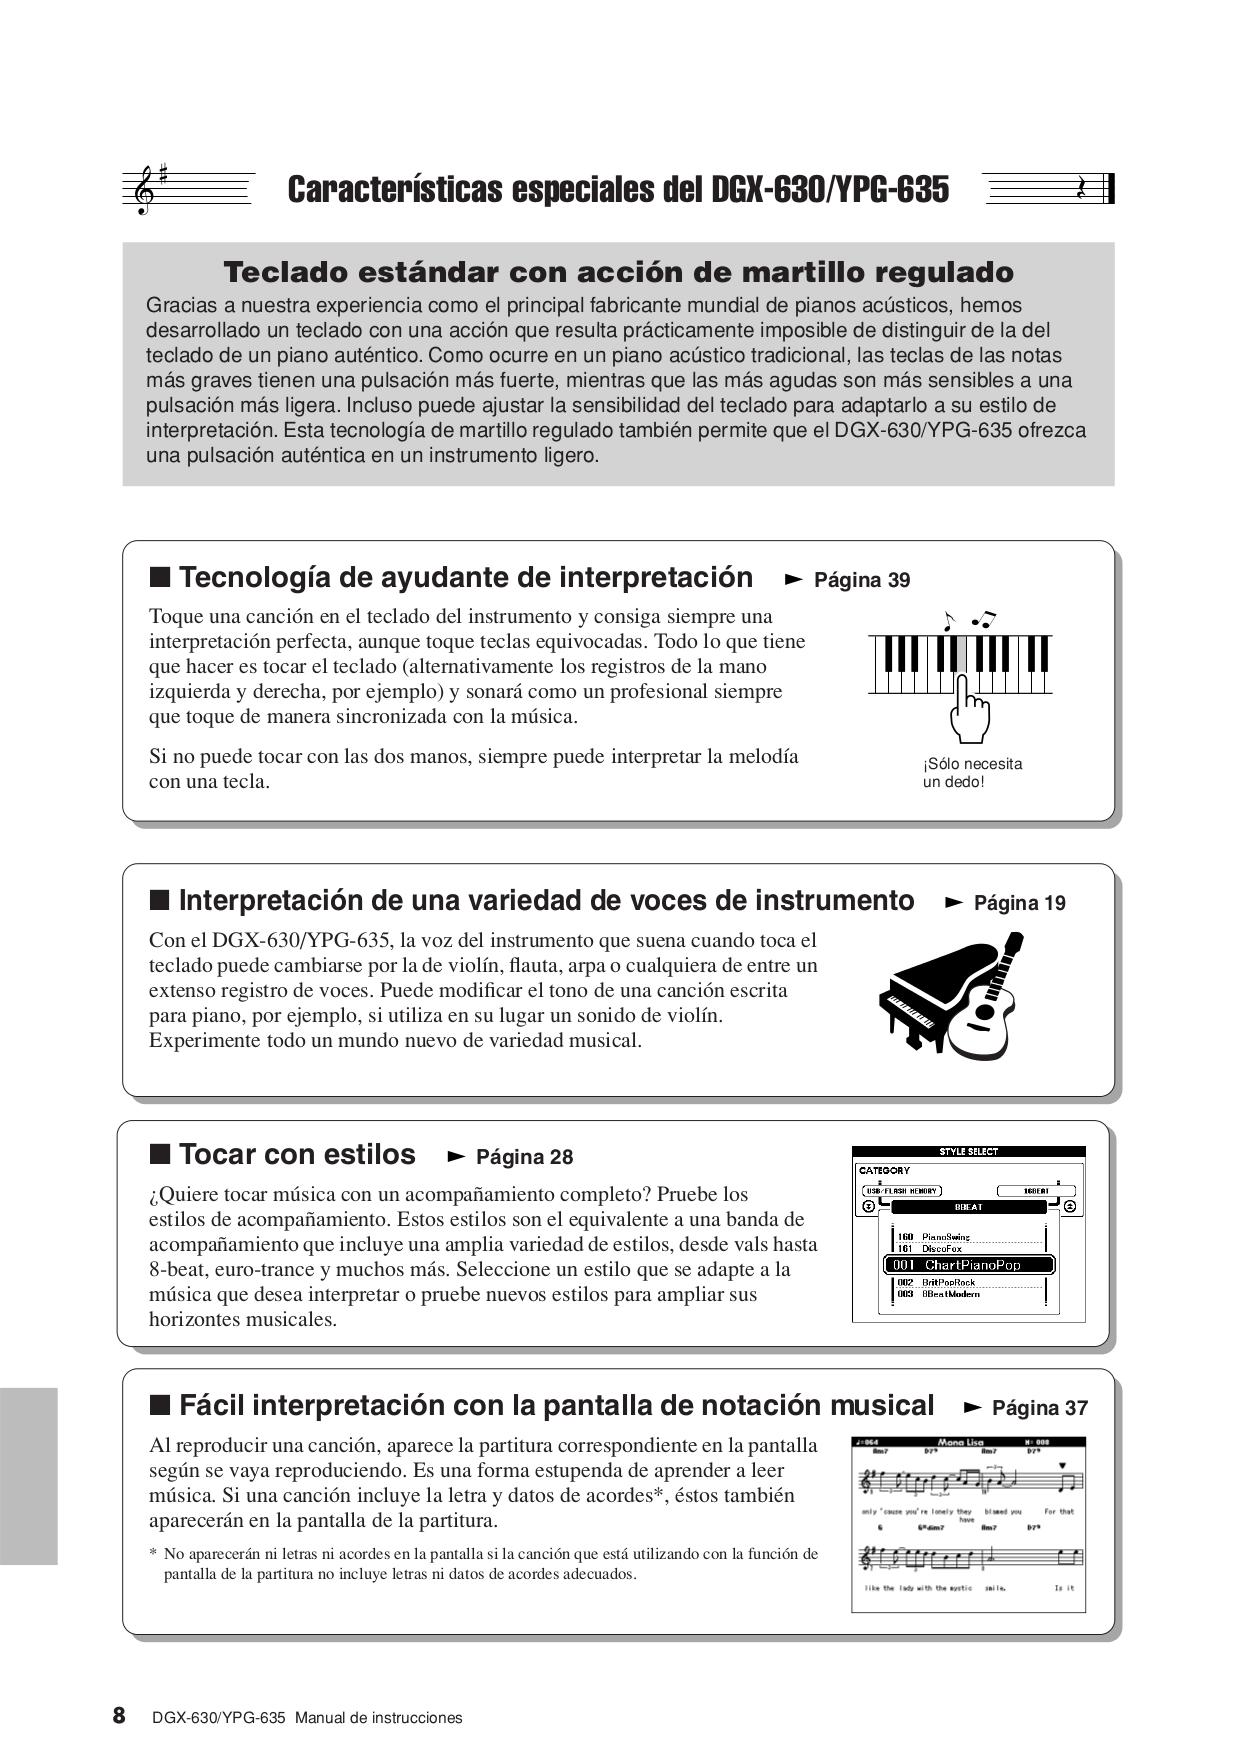 PDF manual for Yamaha Music Keyboard DGX-630